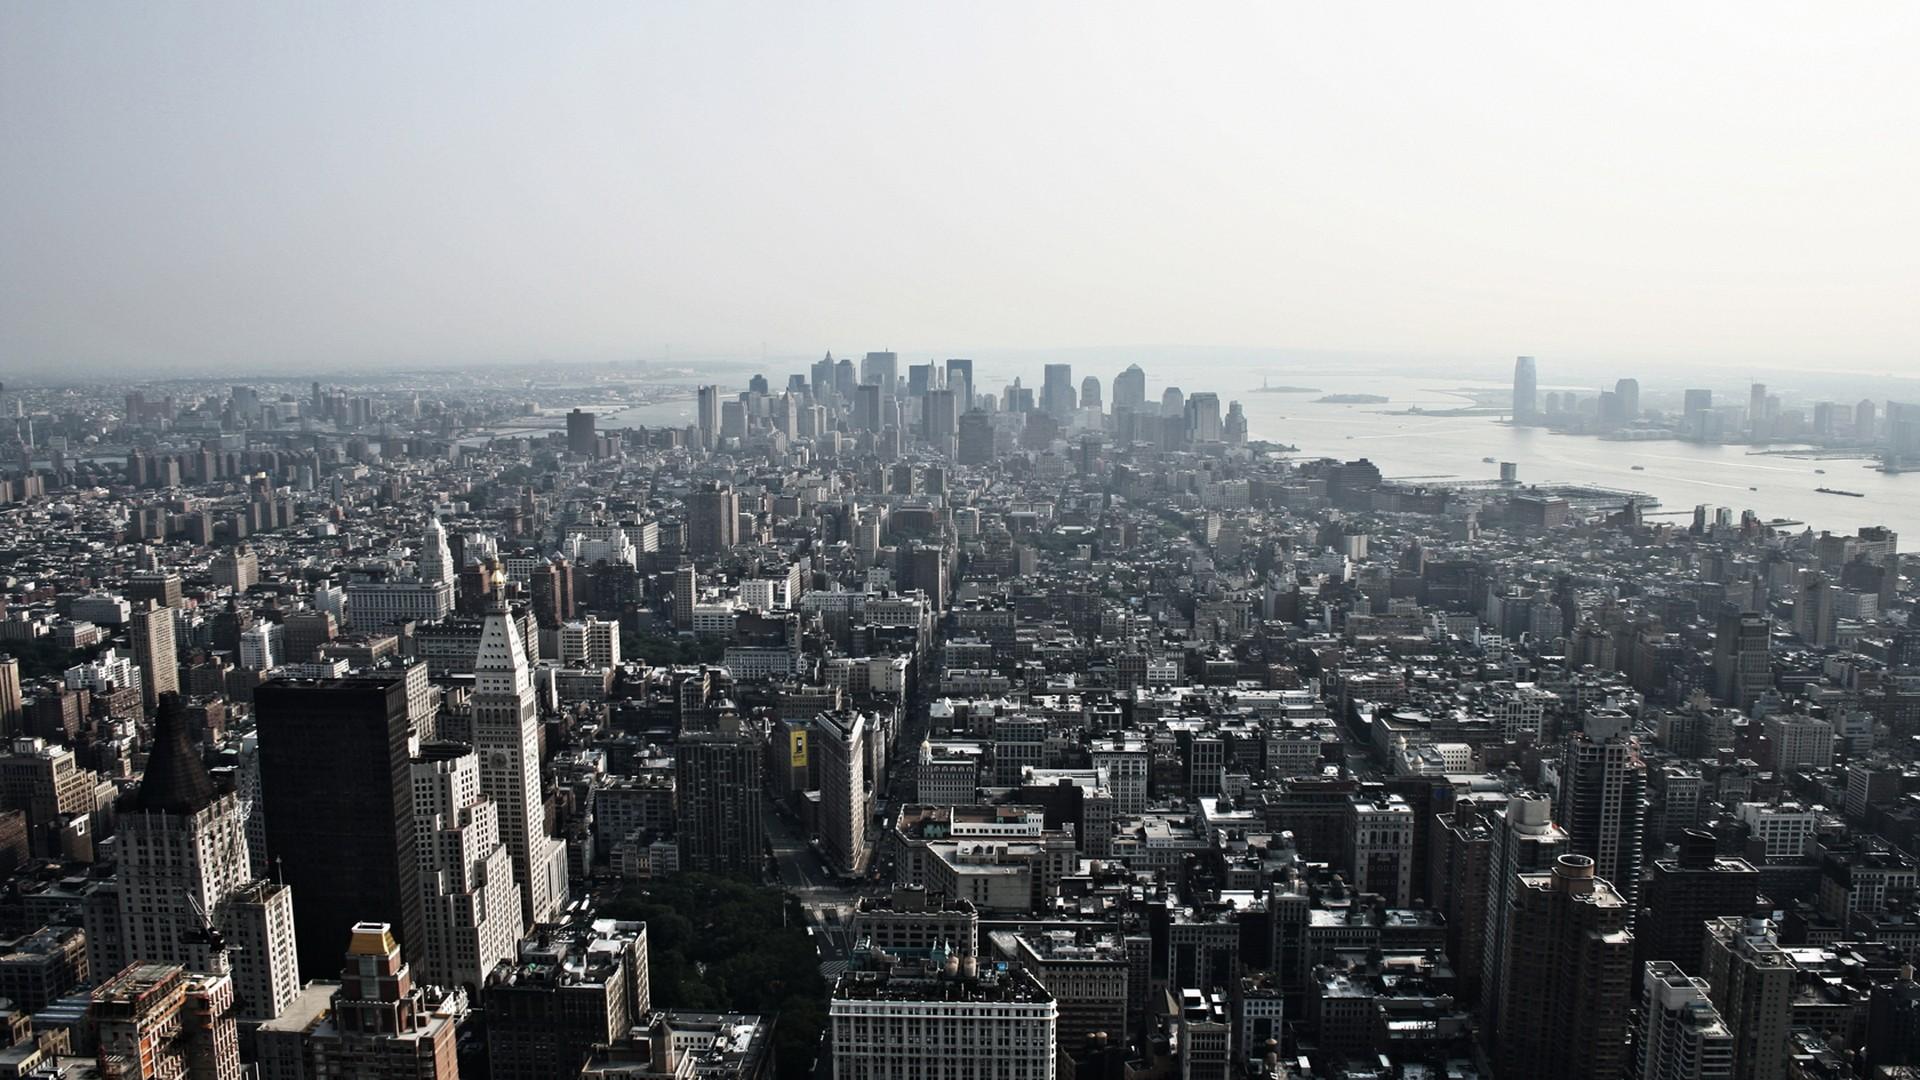 Cityscapes Urban Wallpaper 1920x1080 Cityscapes Urban New York 1920x1080